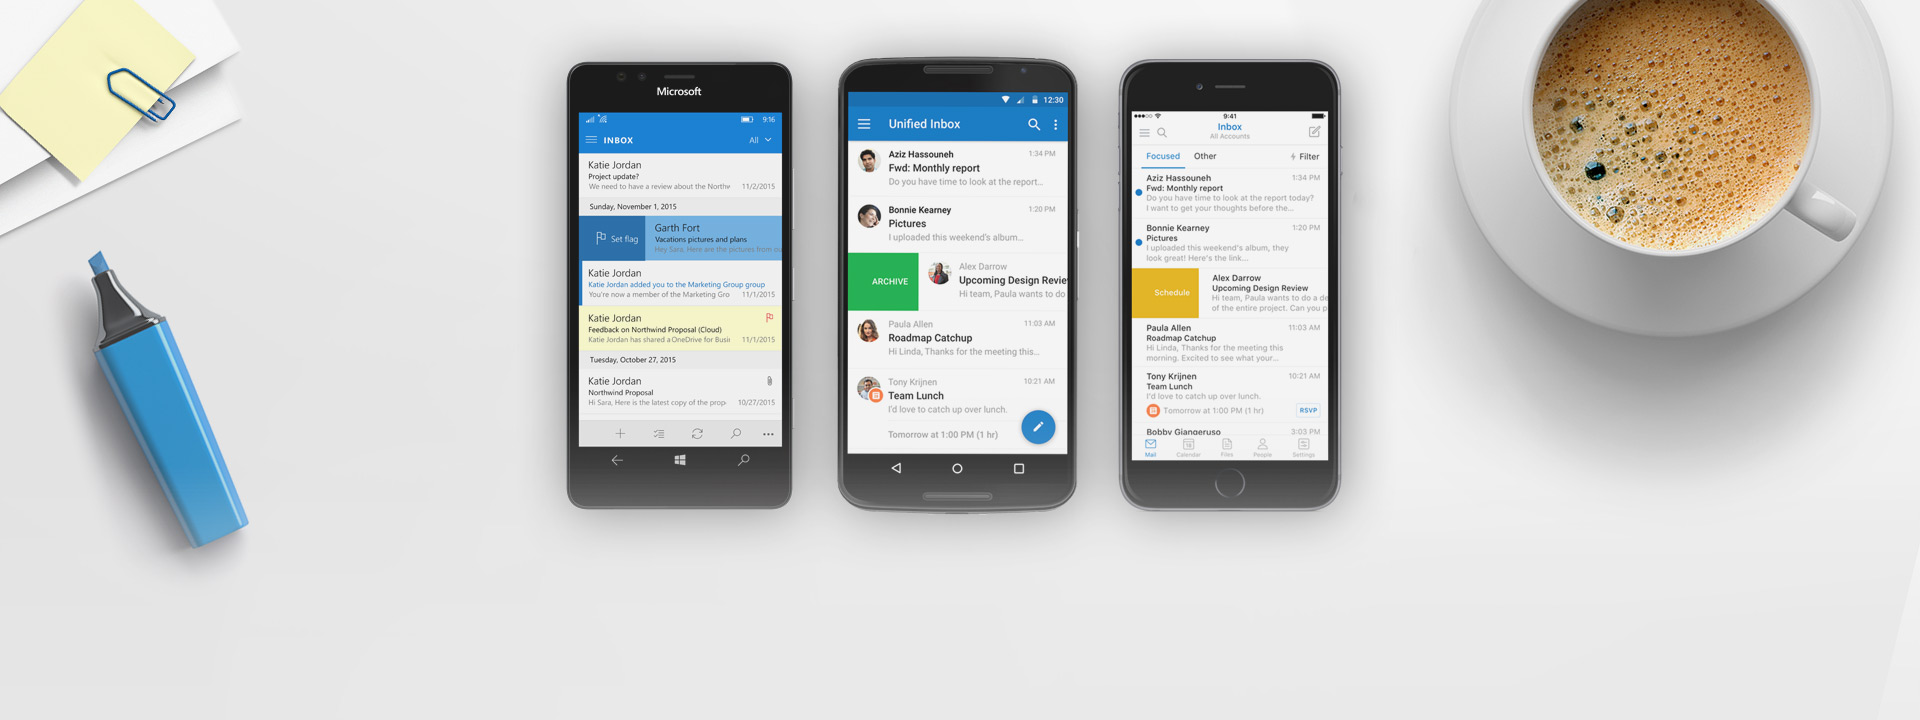 Telefóny so systémom Windows Phone, iPhone a Android s aplikáciou Outlook na displeji